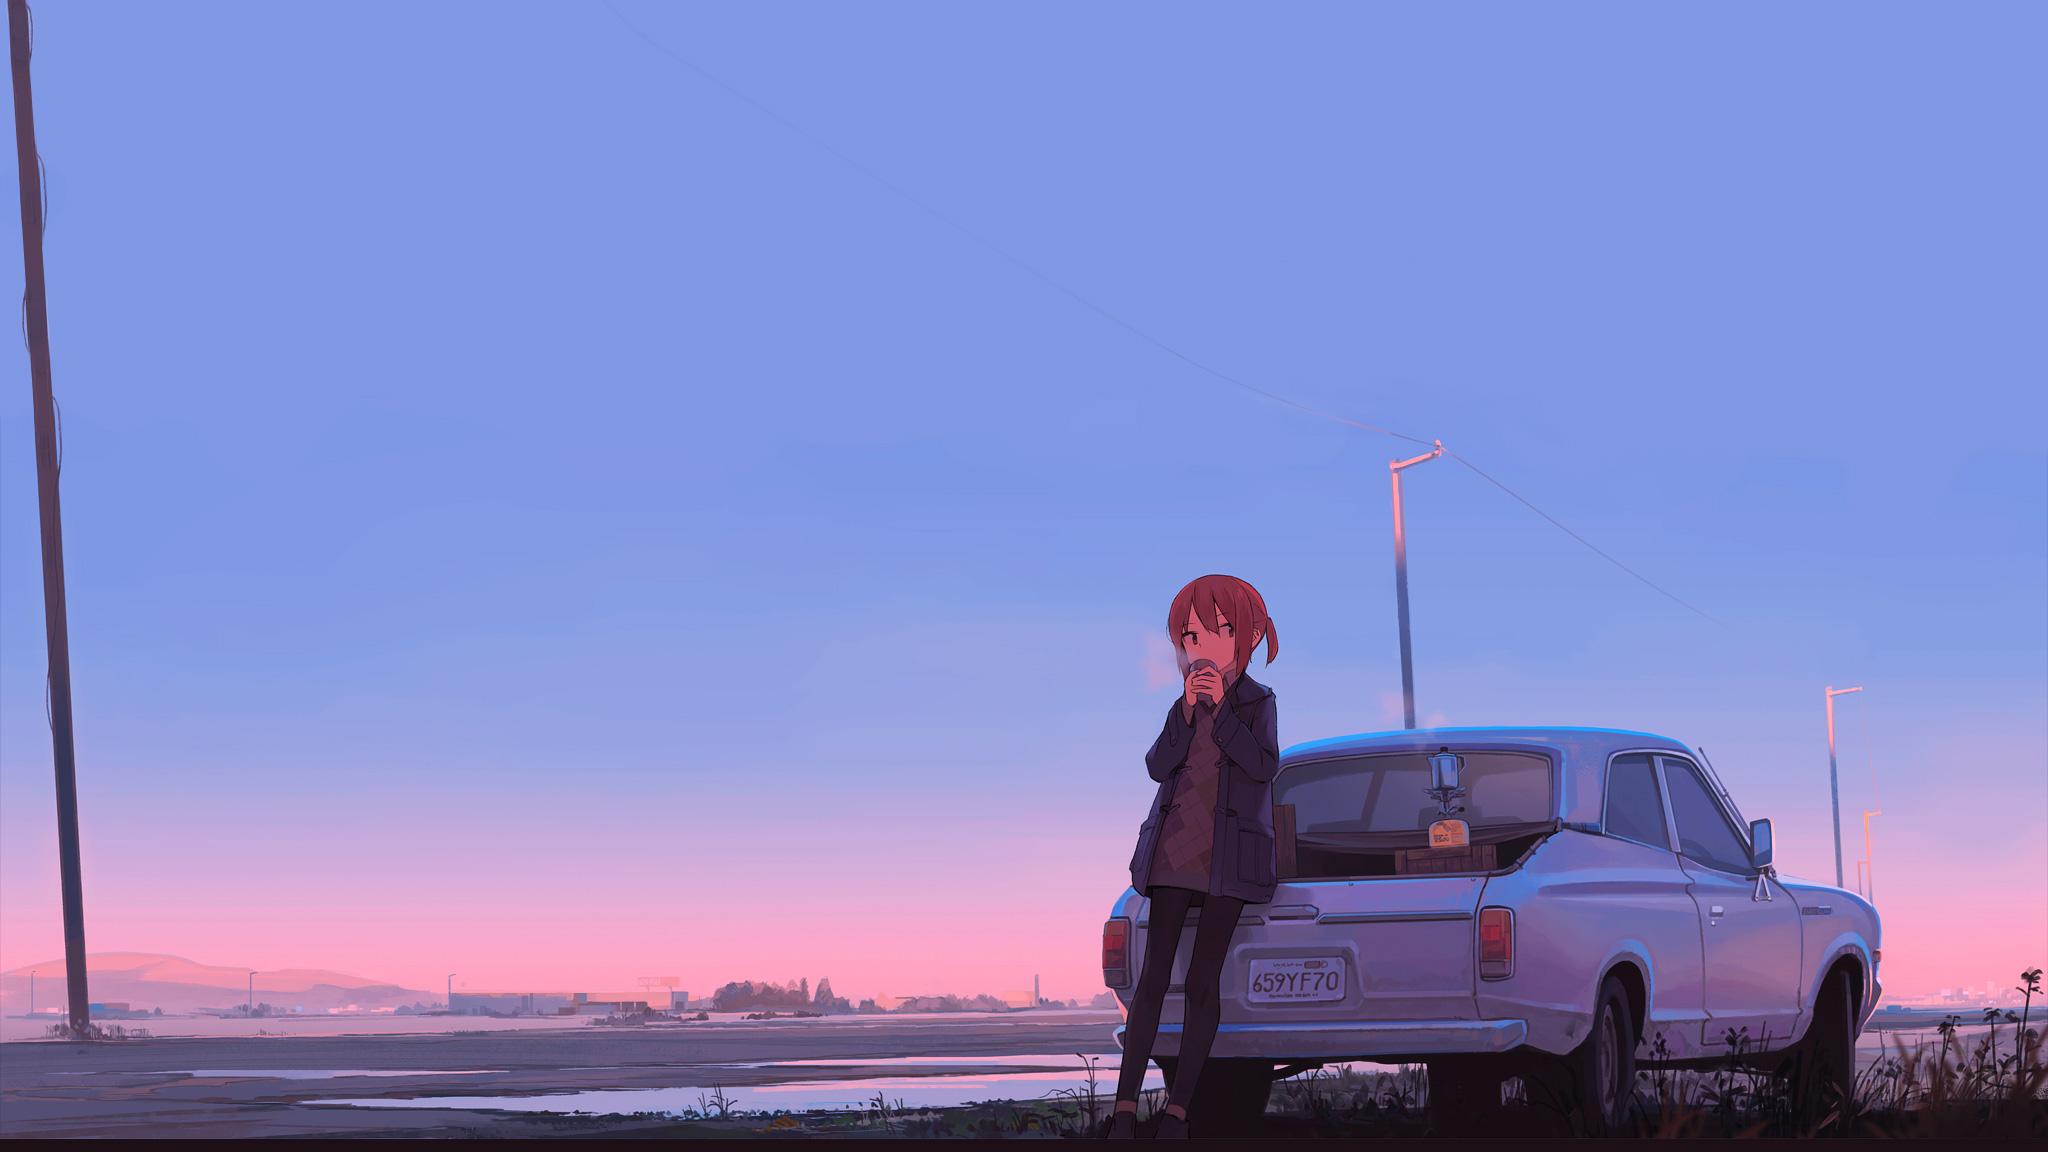 Most Inspiring Wallpaper Anime Car - anime-girl-car-drinking-coffee-co  HD_969485      .jpg